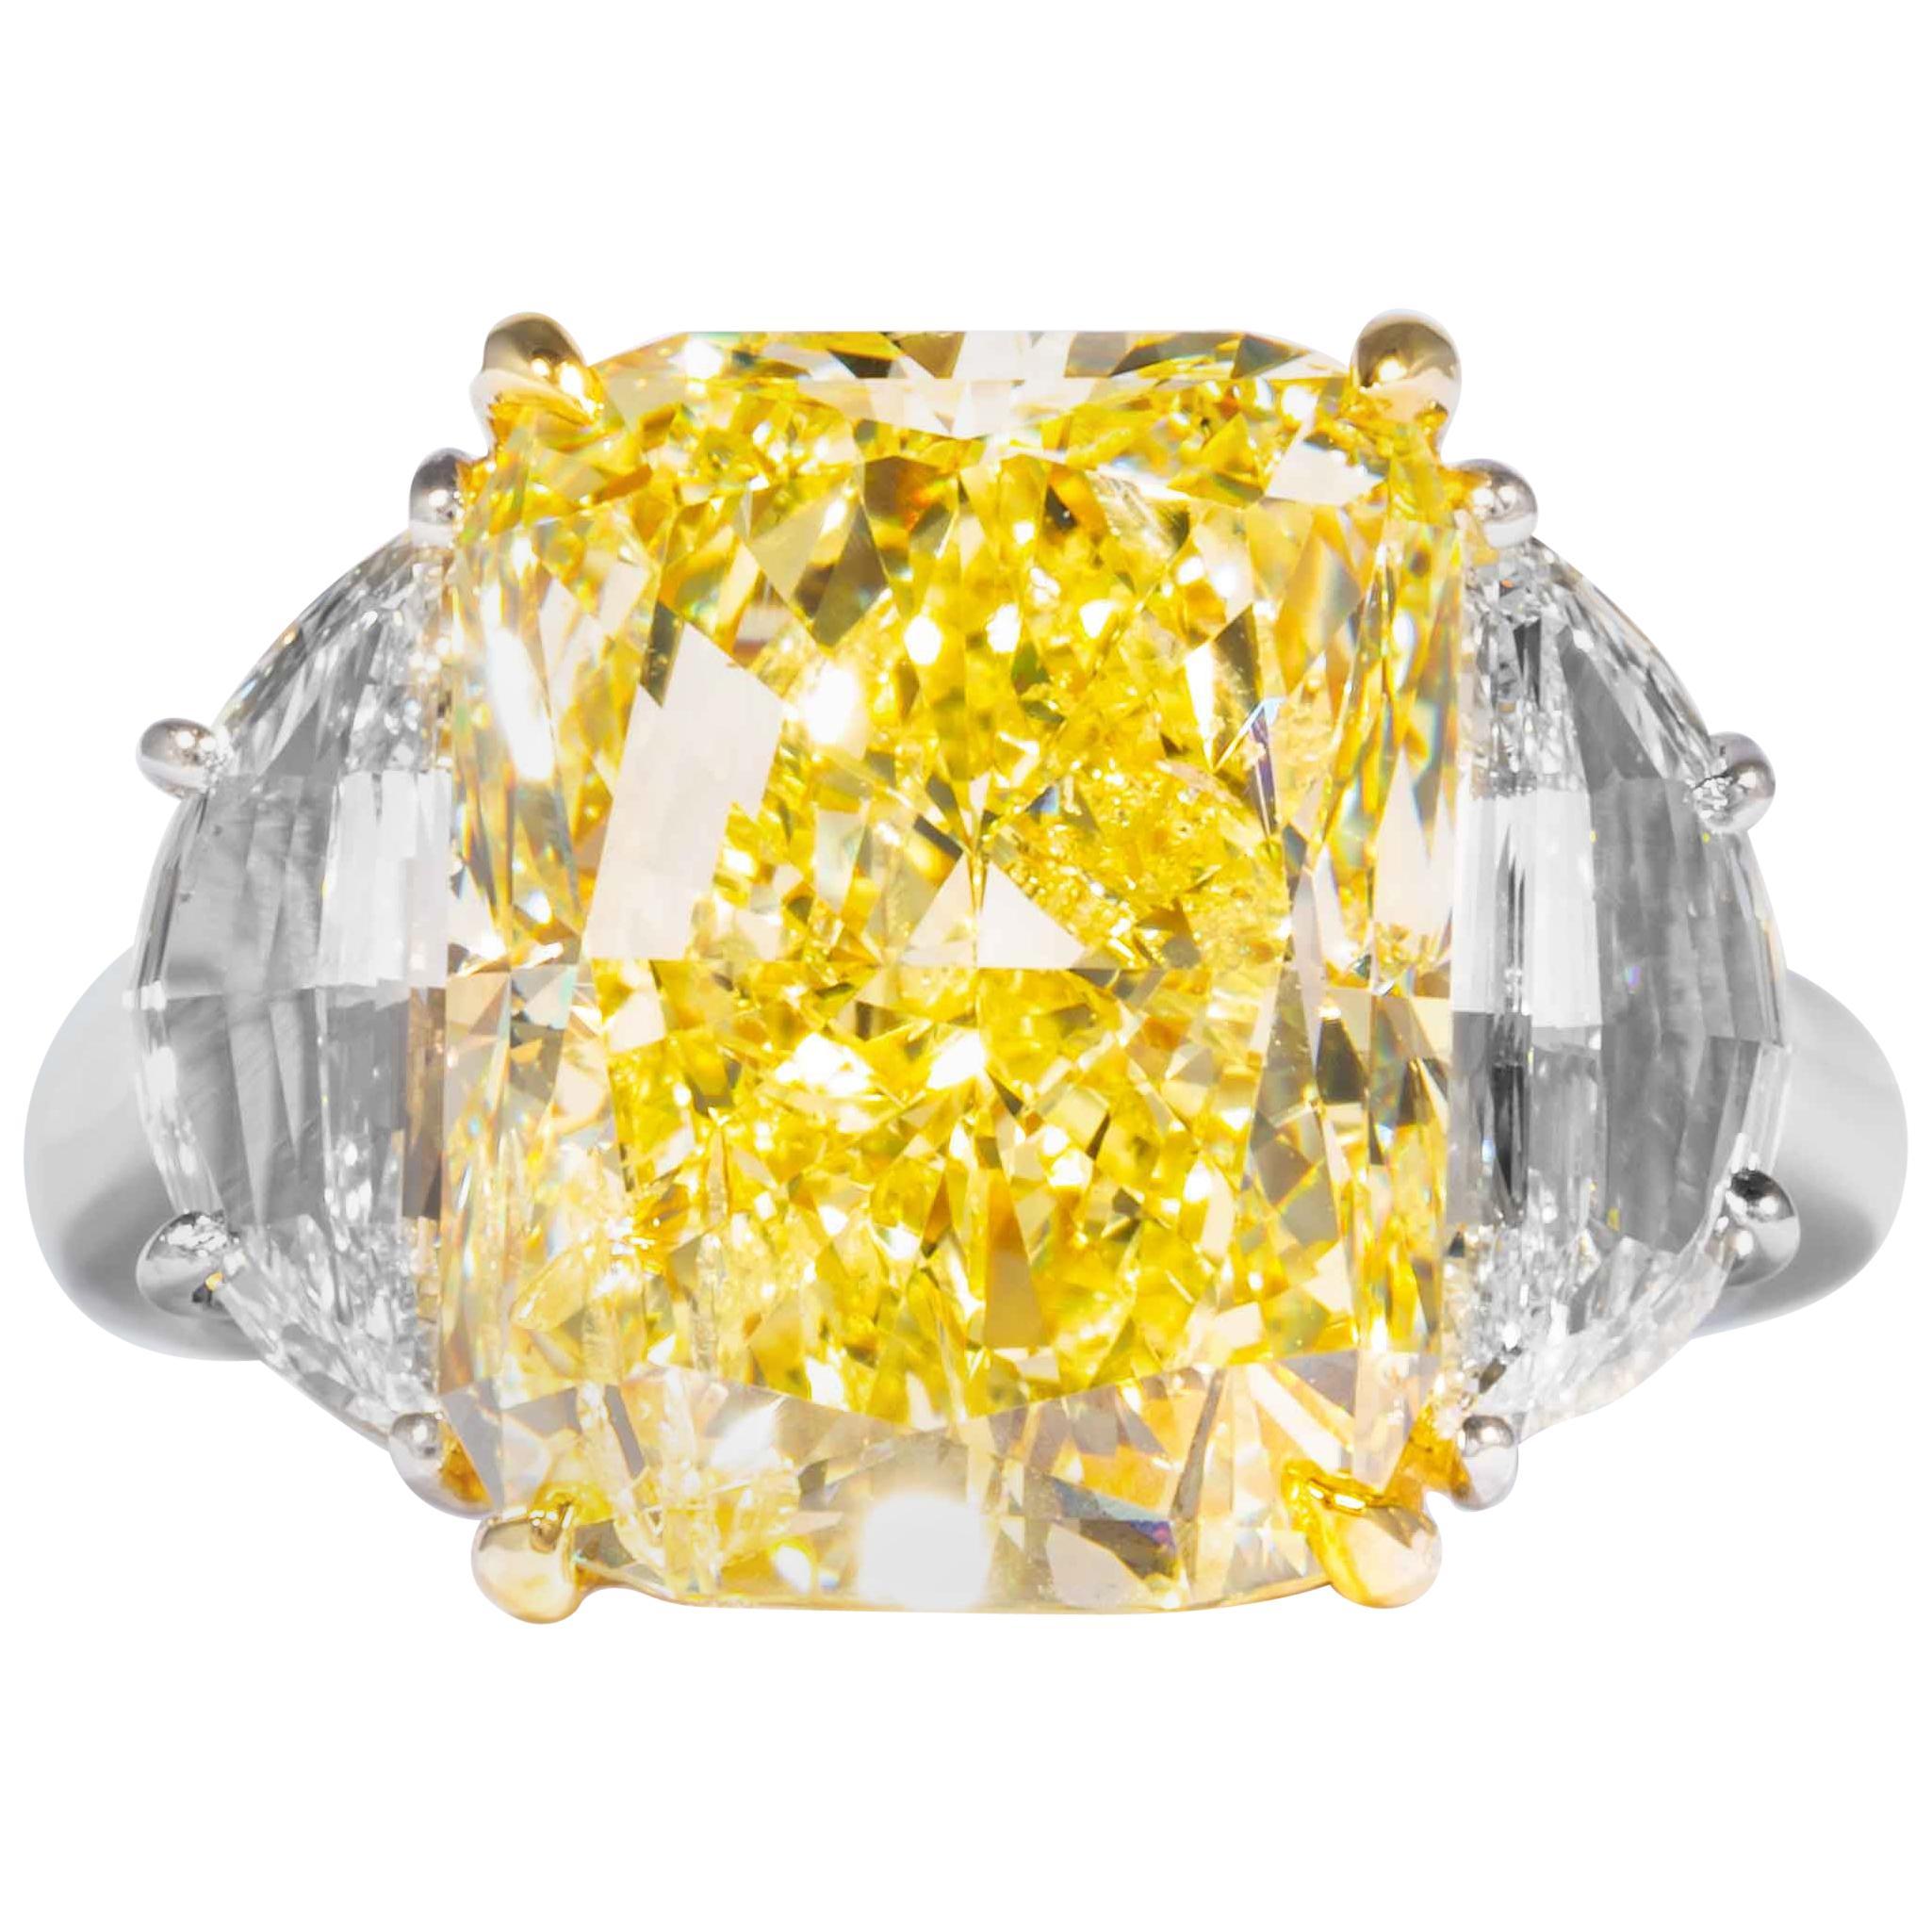 Shreve, Crump & Low GIA Certified 10.04 Carat Fancy Yellow Radiant Diamond Ring